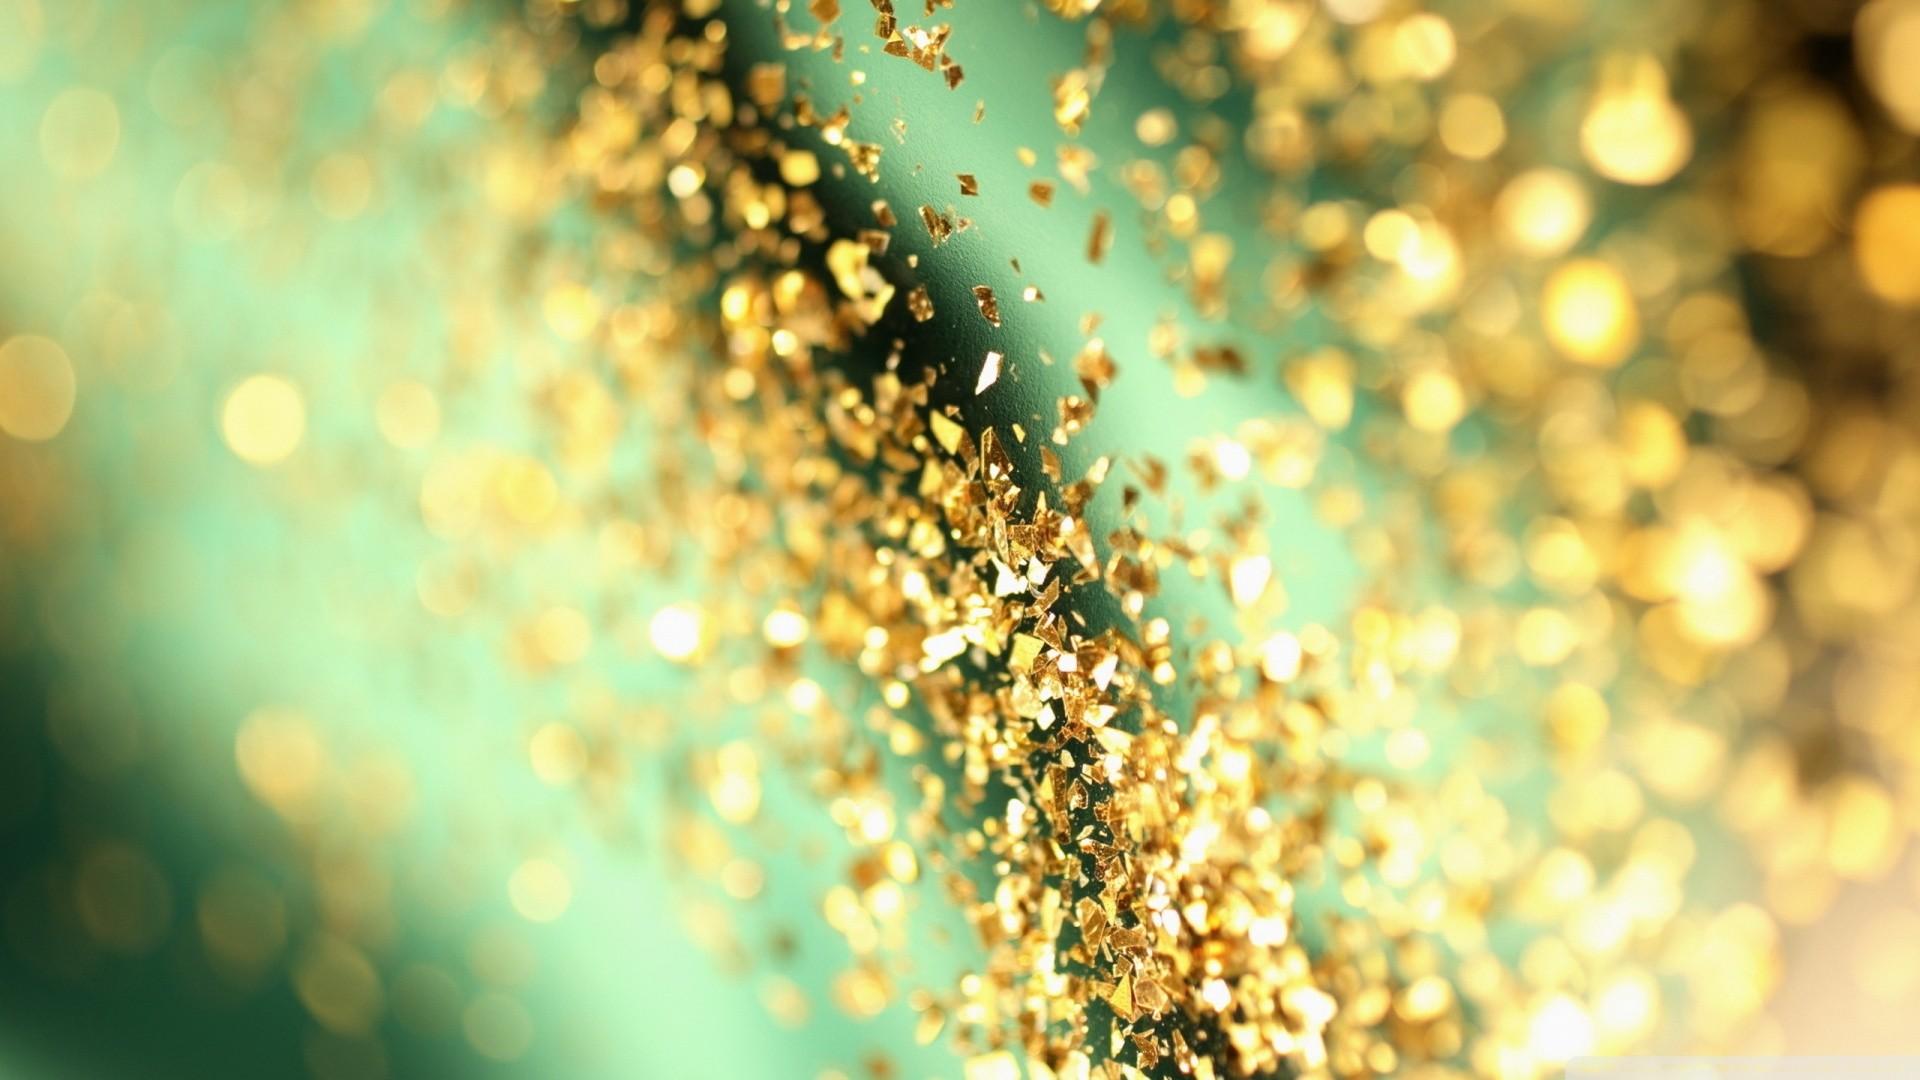 Bokeh Wallpaper Gold Glitter Bokeh Wallpapers